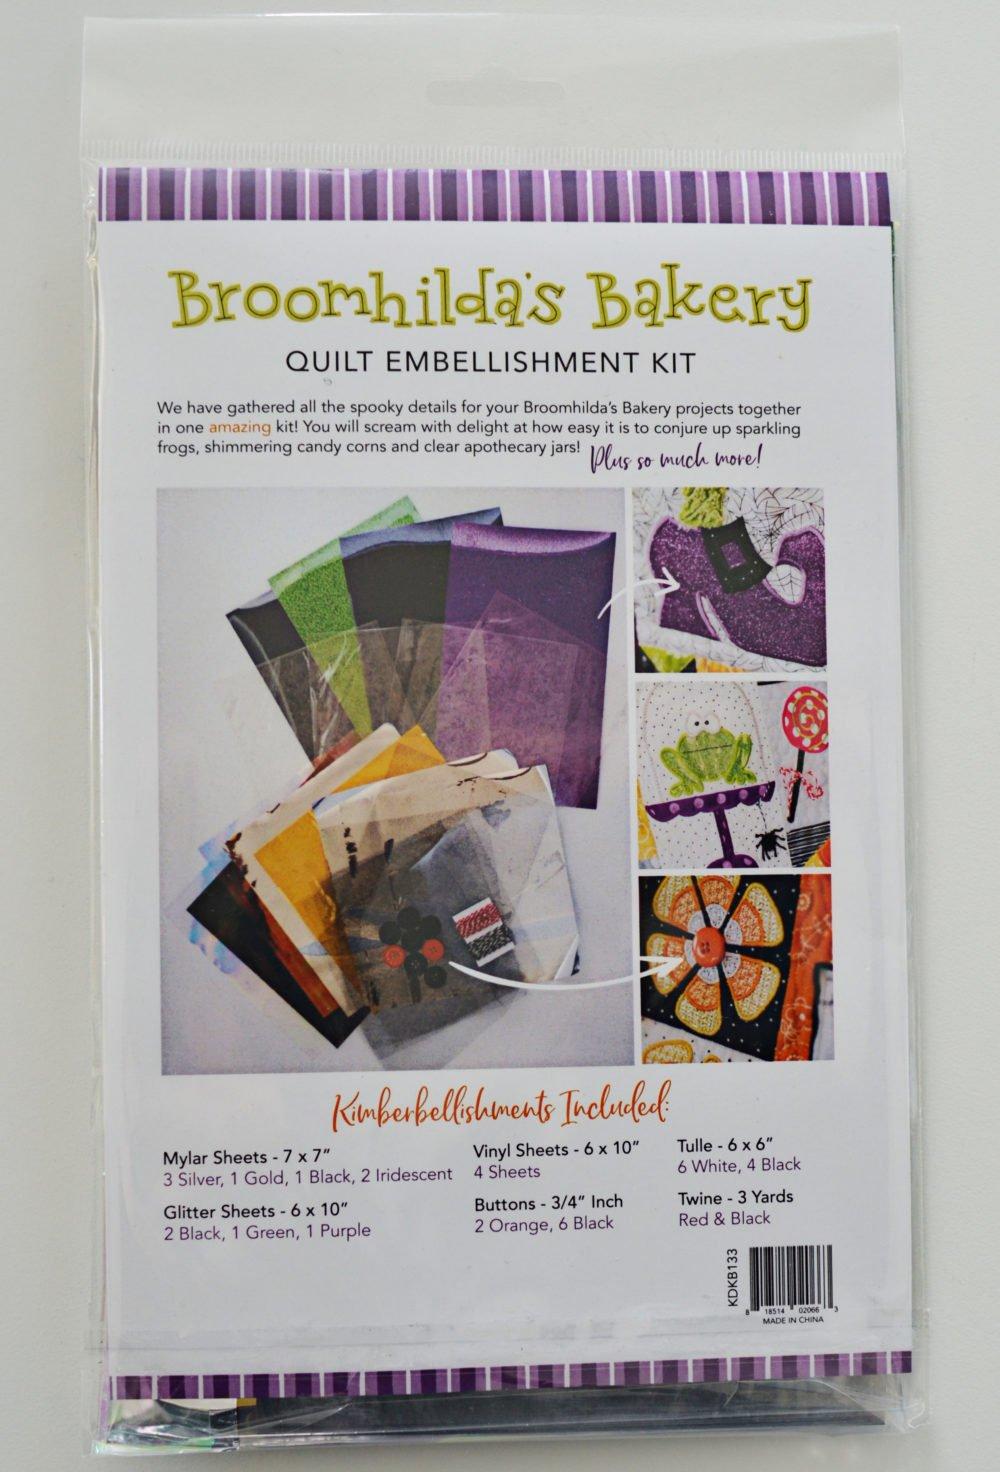 Kimberbell - Broomhilda's Bakery Embellishment Kit